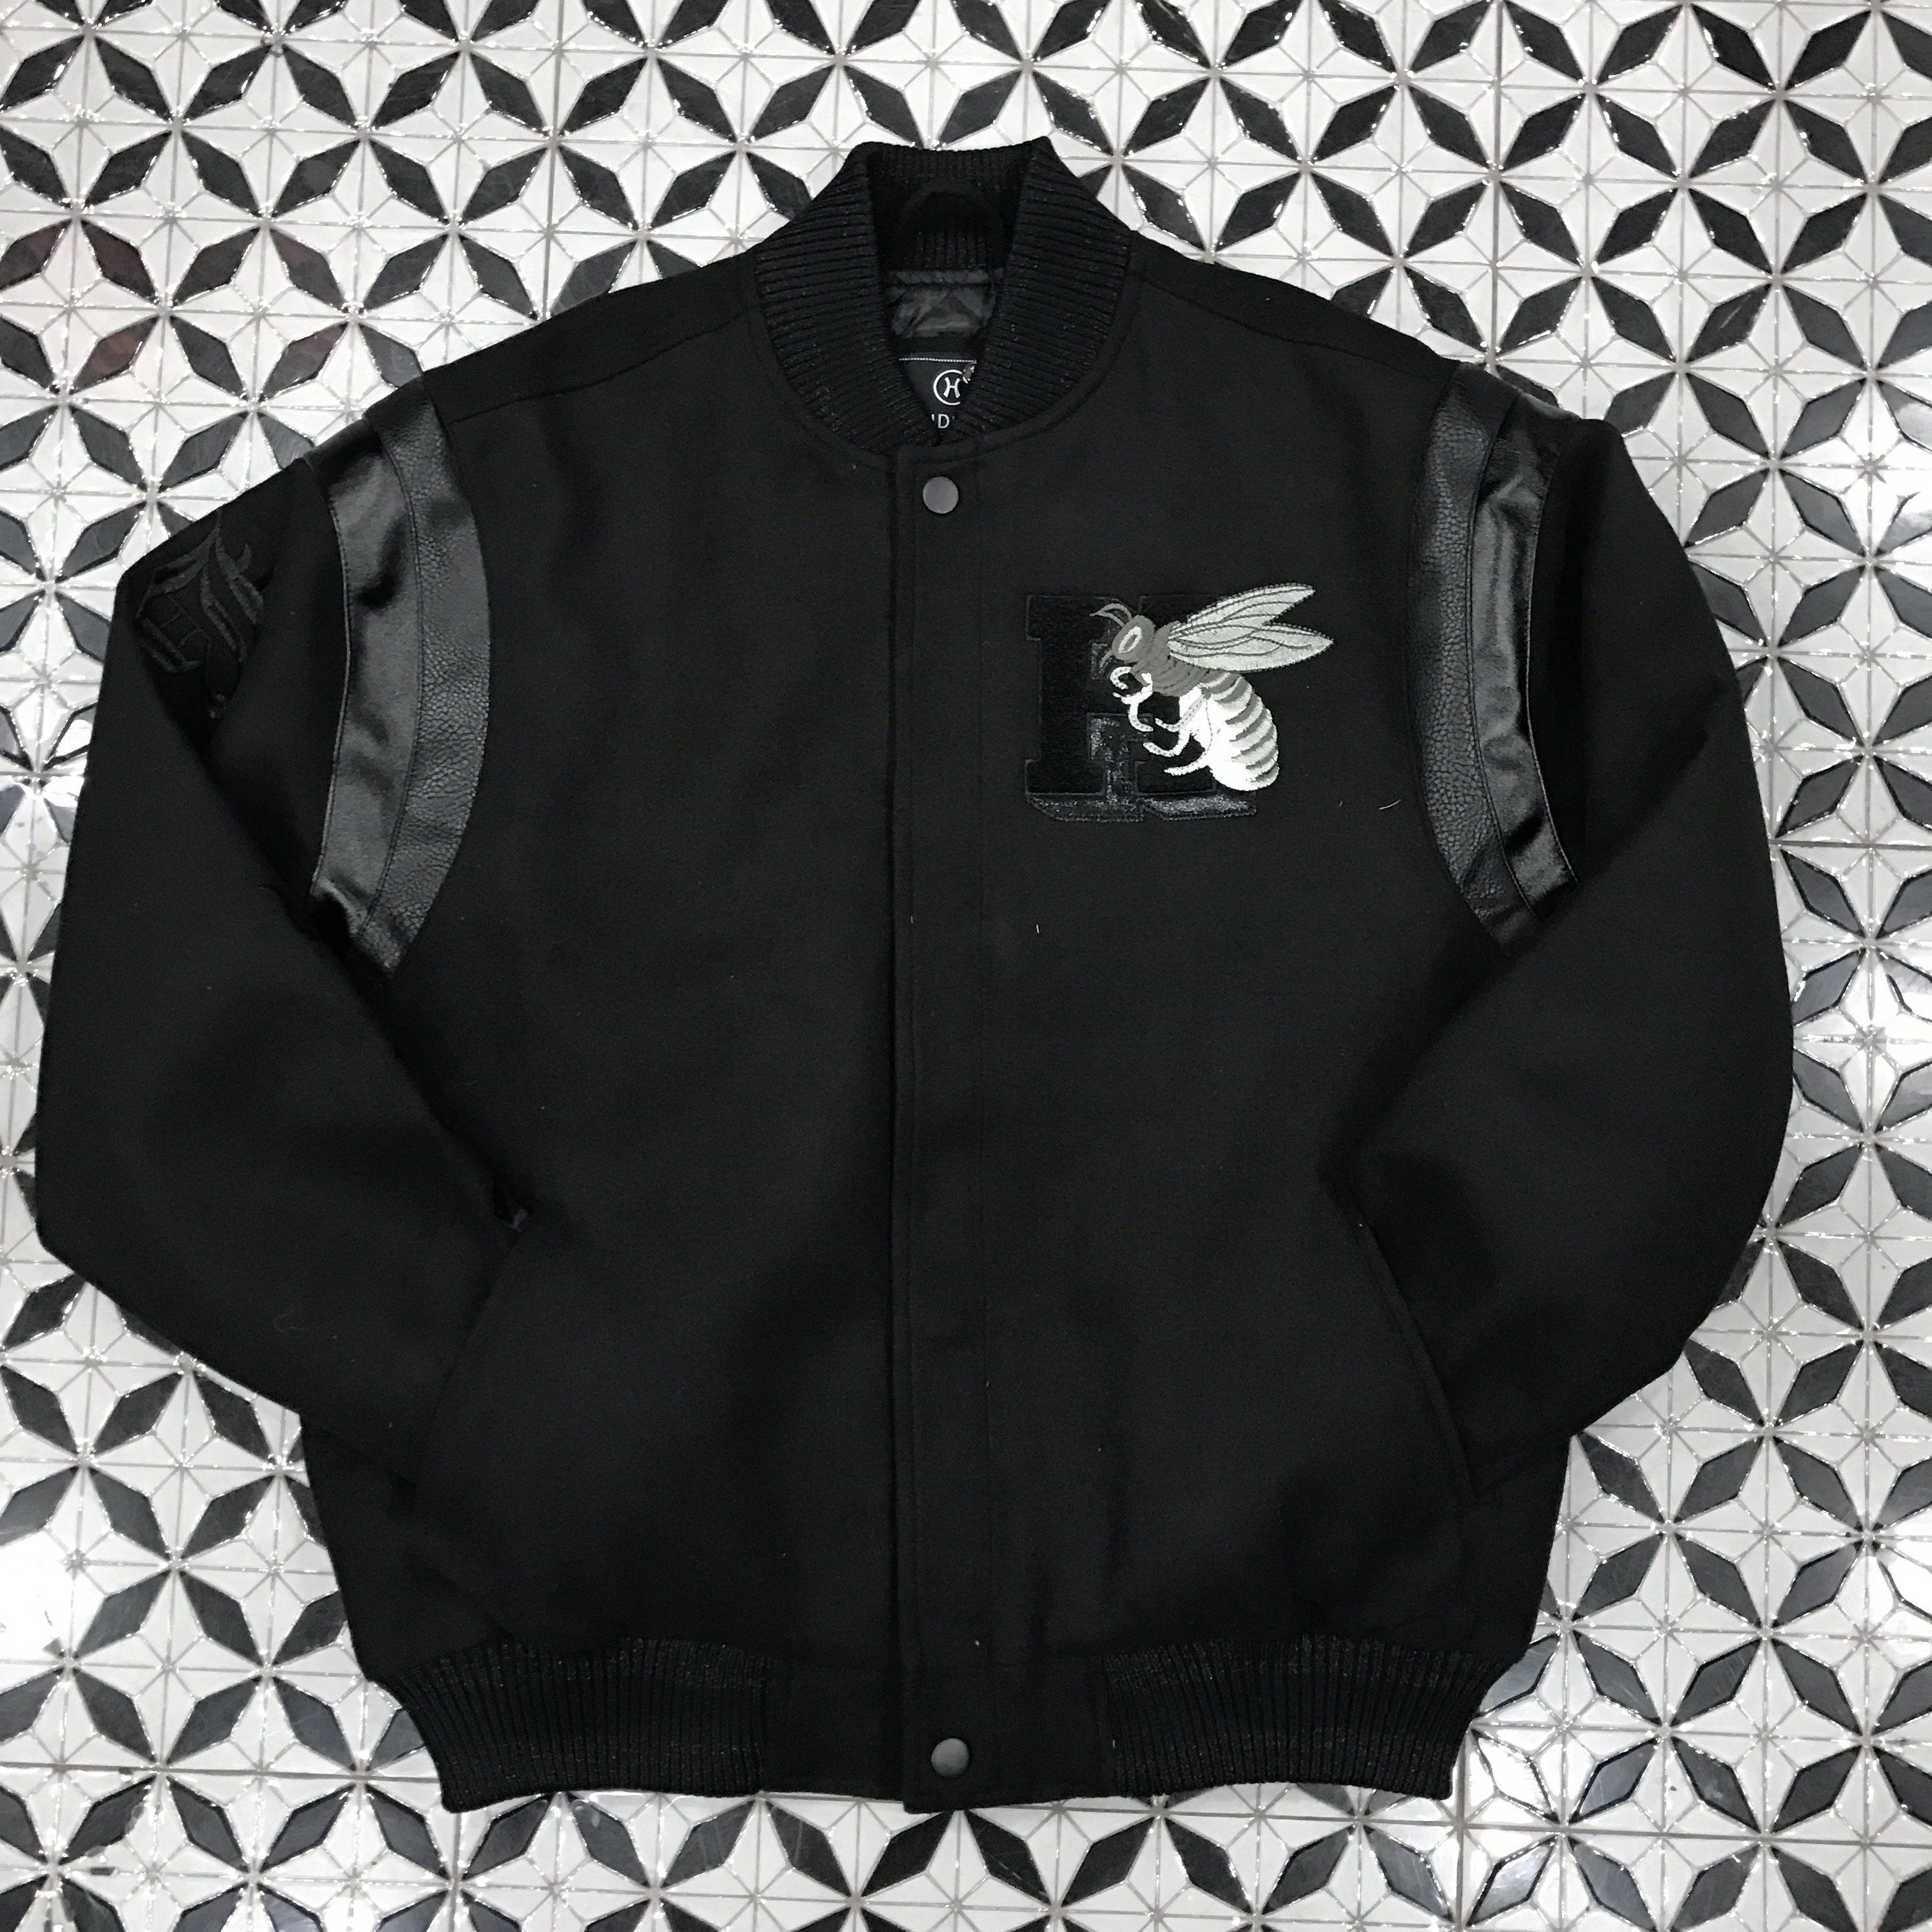 Hudson Black Hated Varsity Jacket Jackets Varsity Jacket Coats Jackets [ 3024 x 3024 Pixel ]